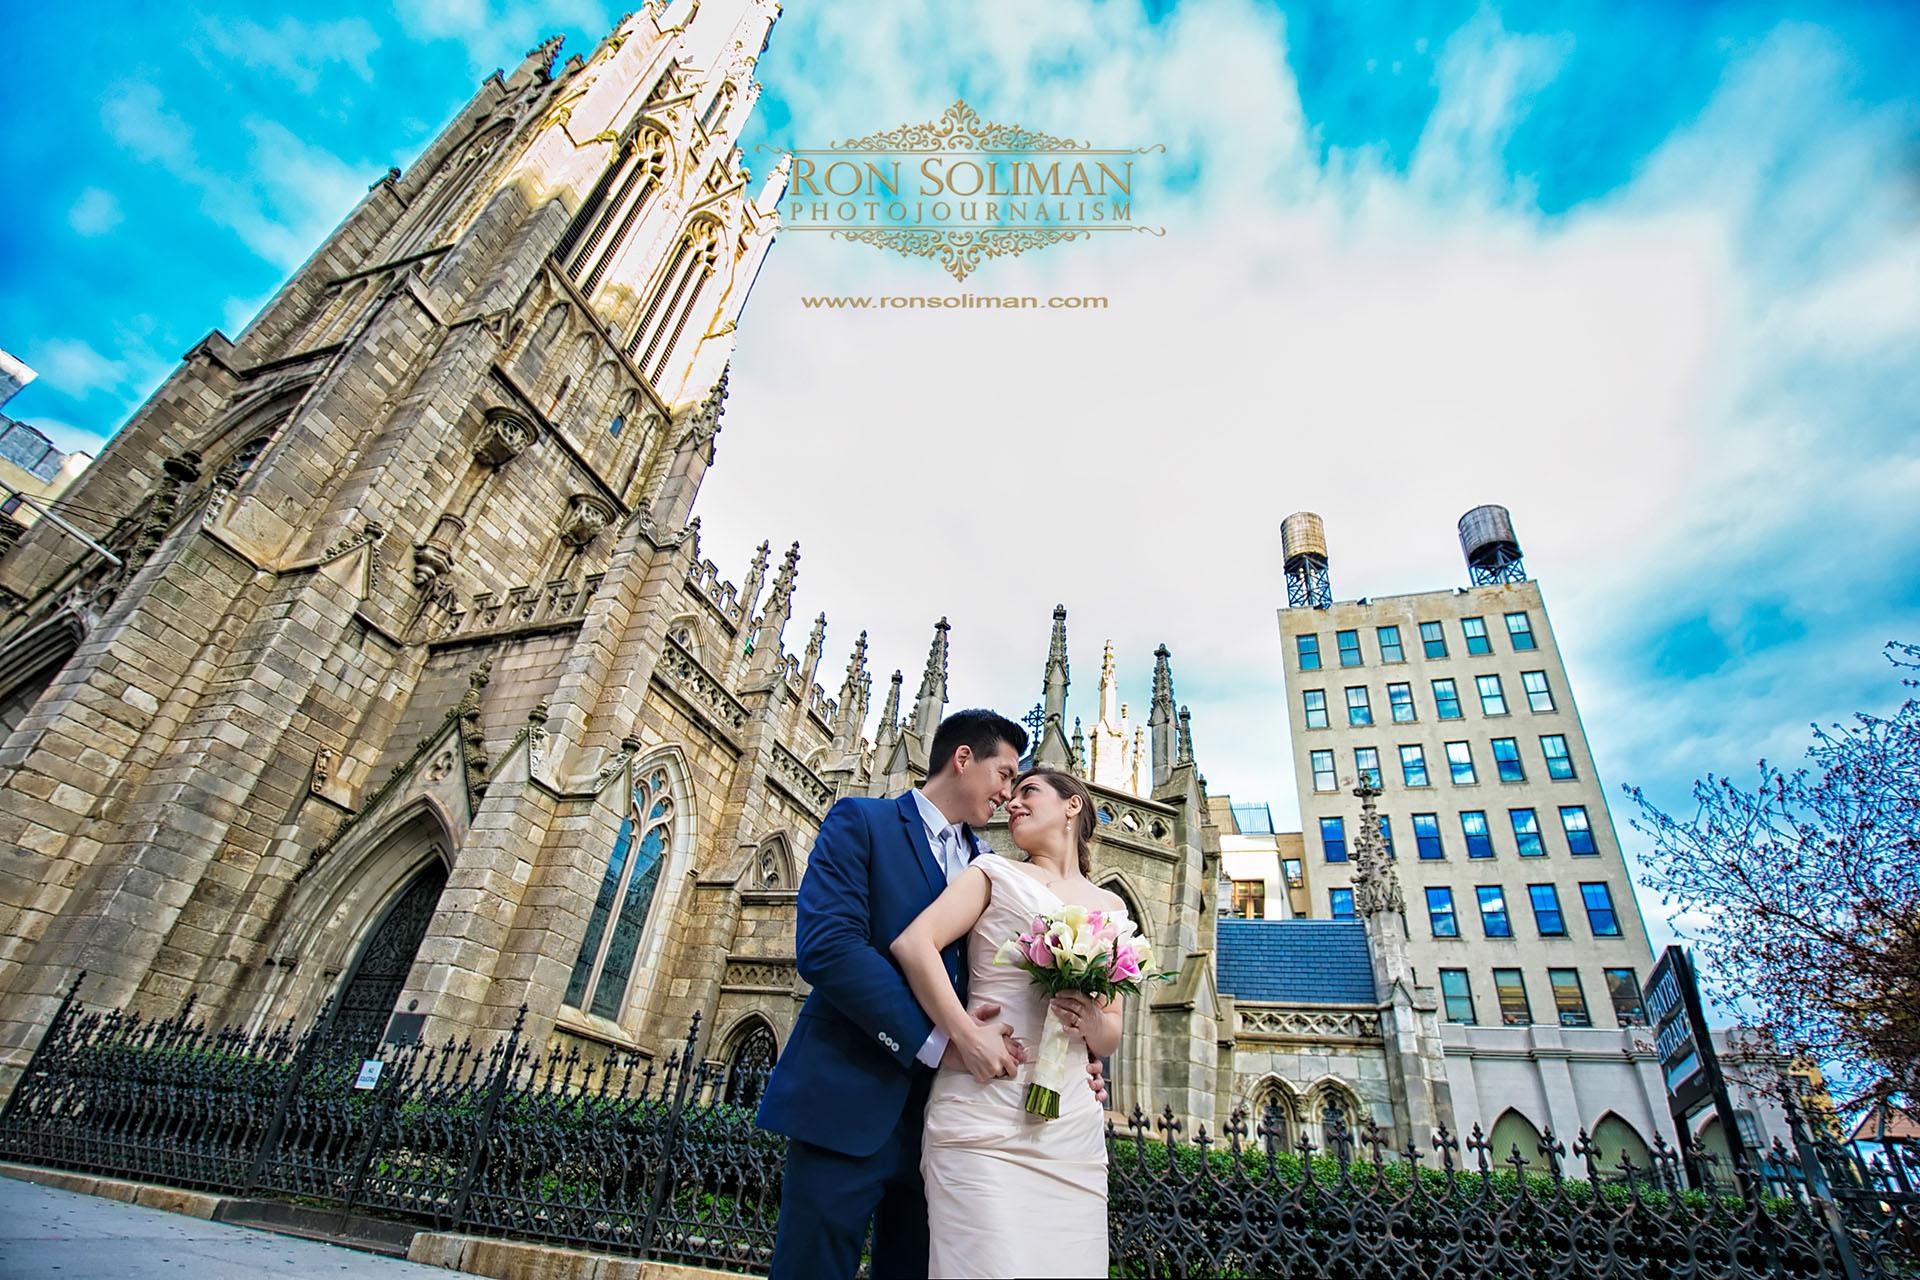 LIGHTHOUSE CHELSEA PIERS WEDDING 19